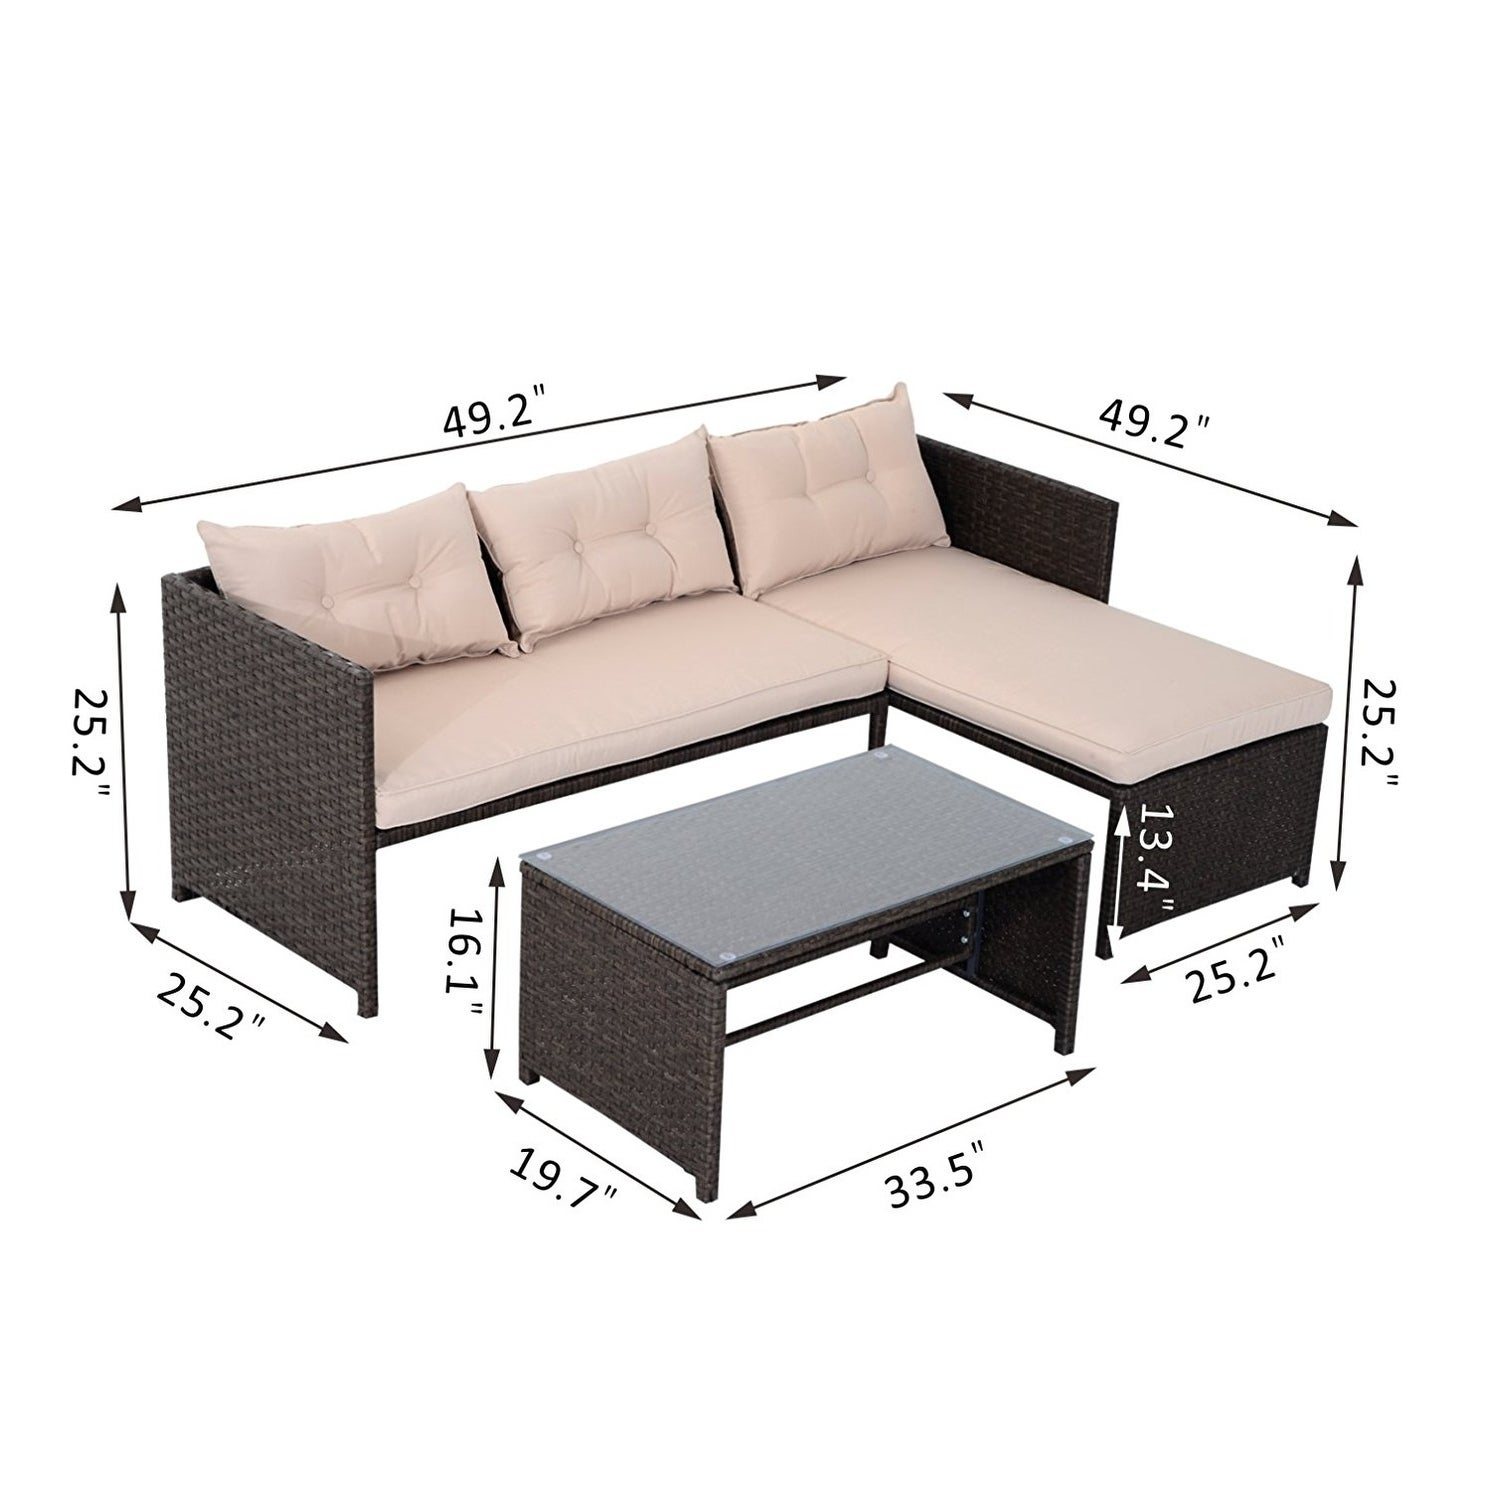 Shop Outsunny Brown Tan Rattan Wicker 3 Piece Outdoor Patio Sofa And